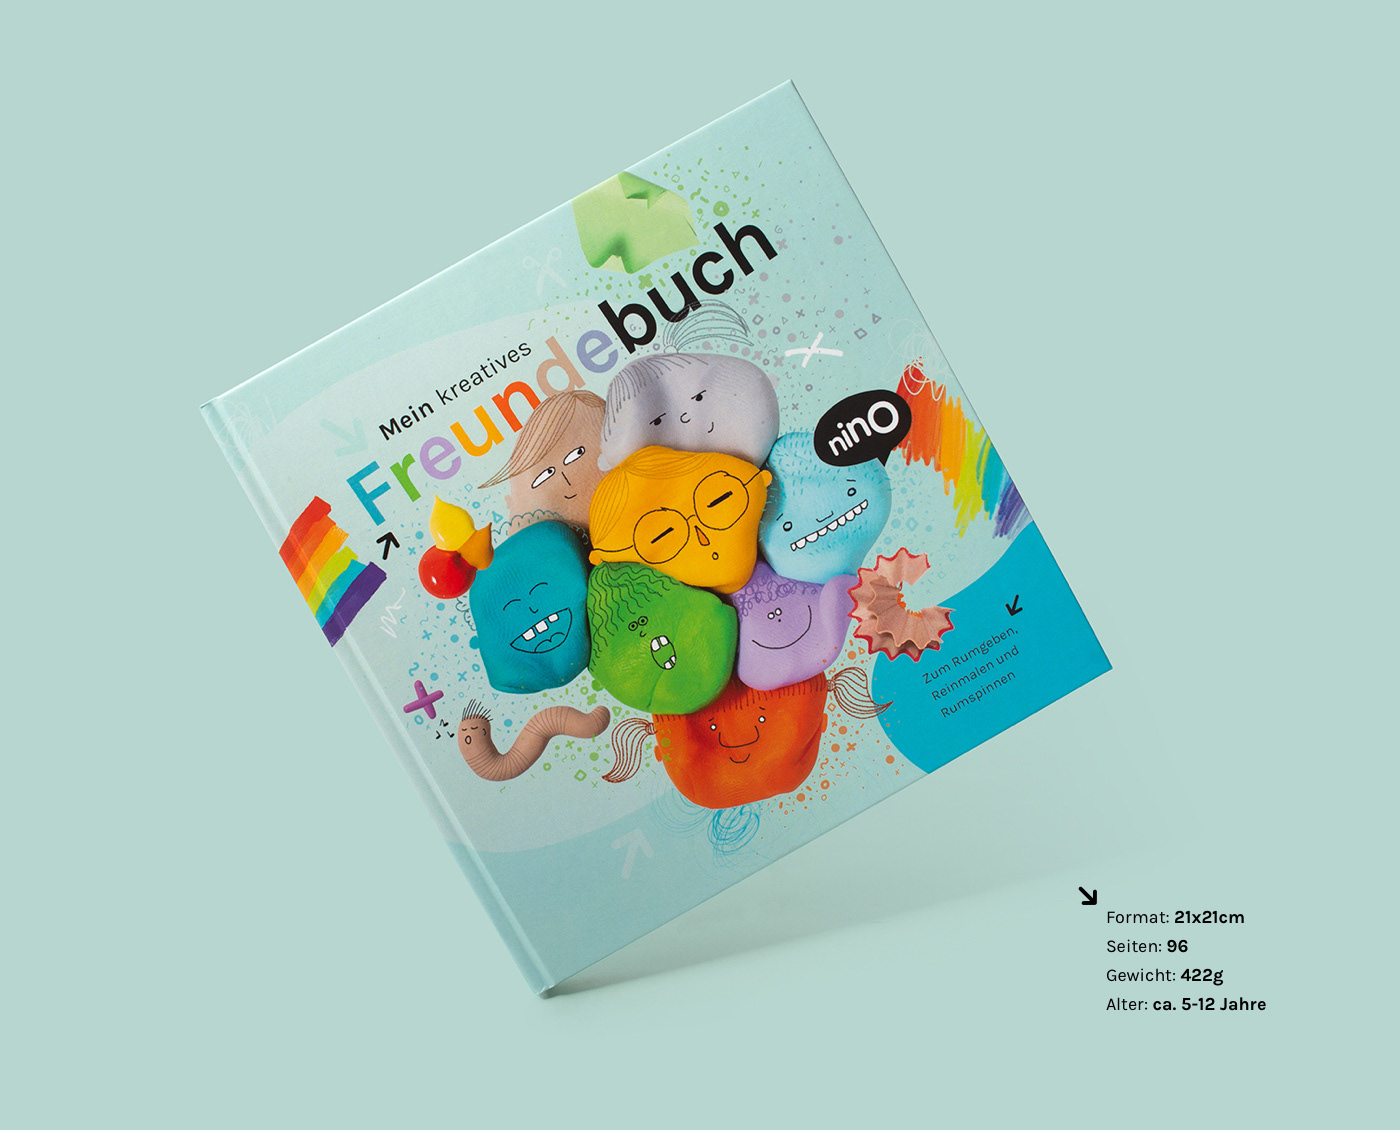 clay Freundebuch collage mixedmedia book friendship book kids book kids product kids brand Corporate Design